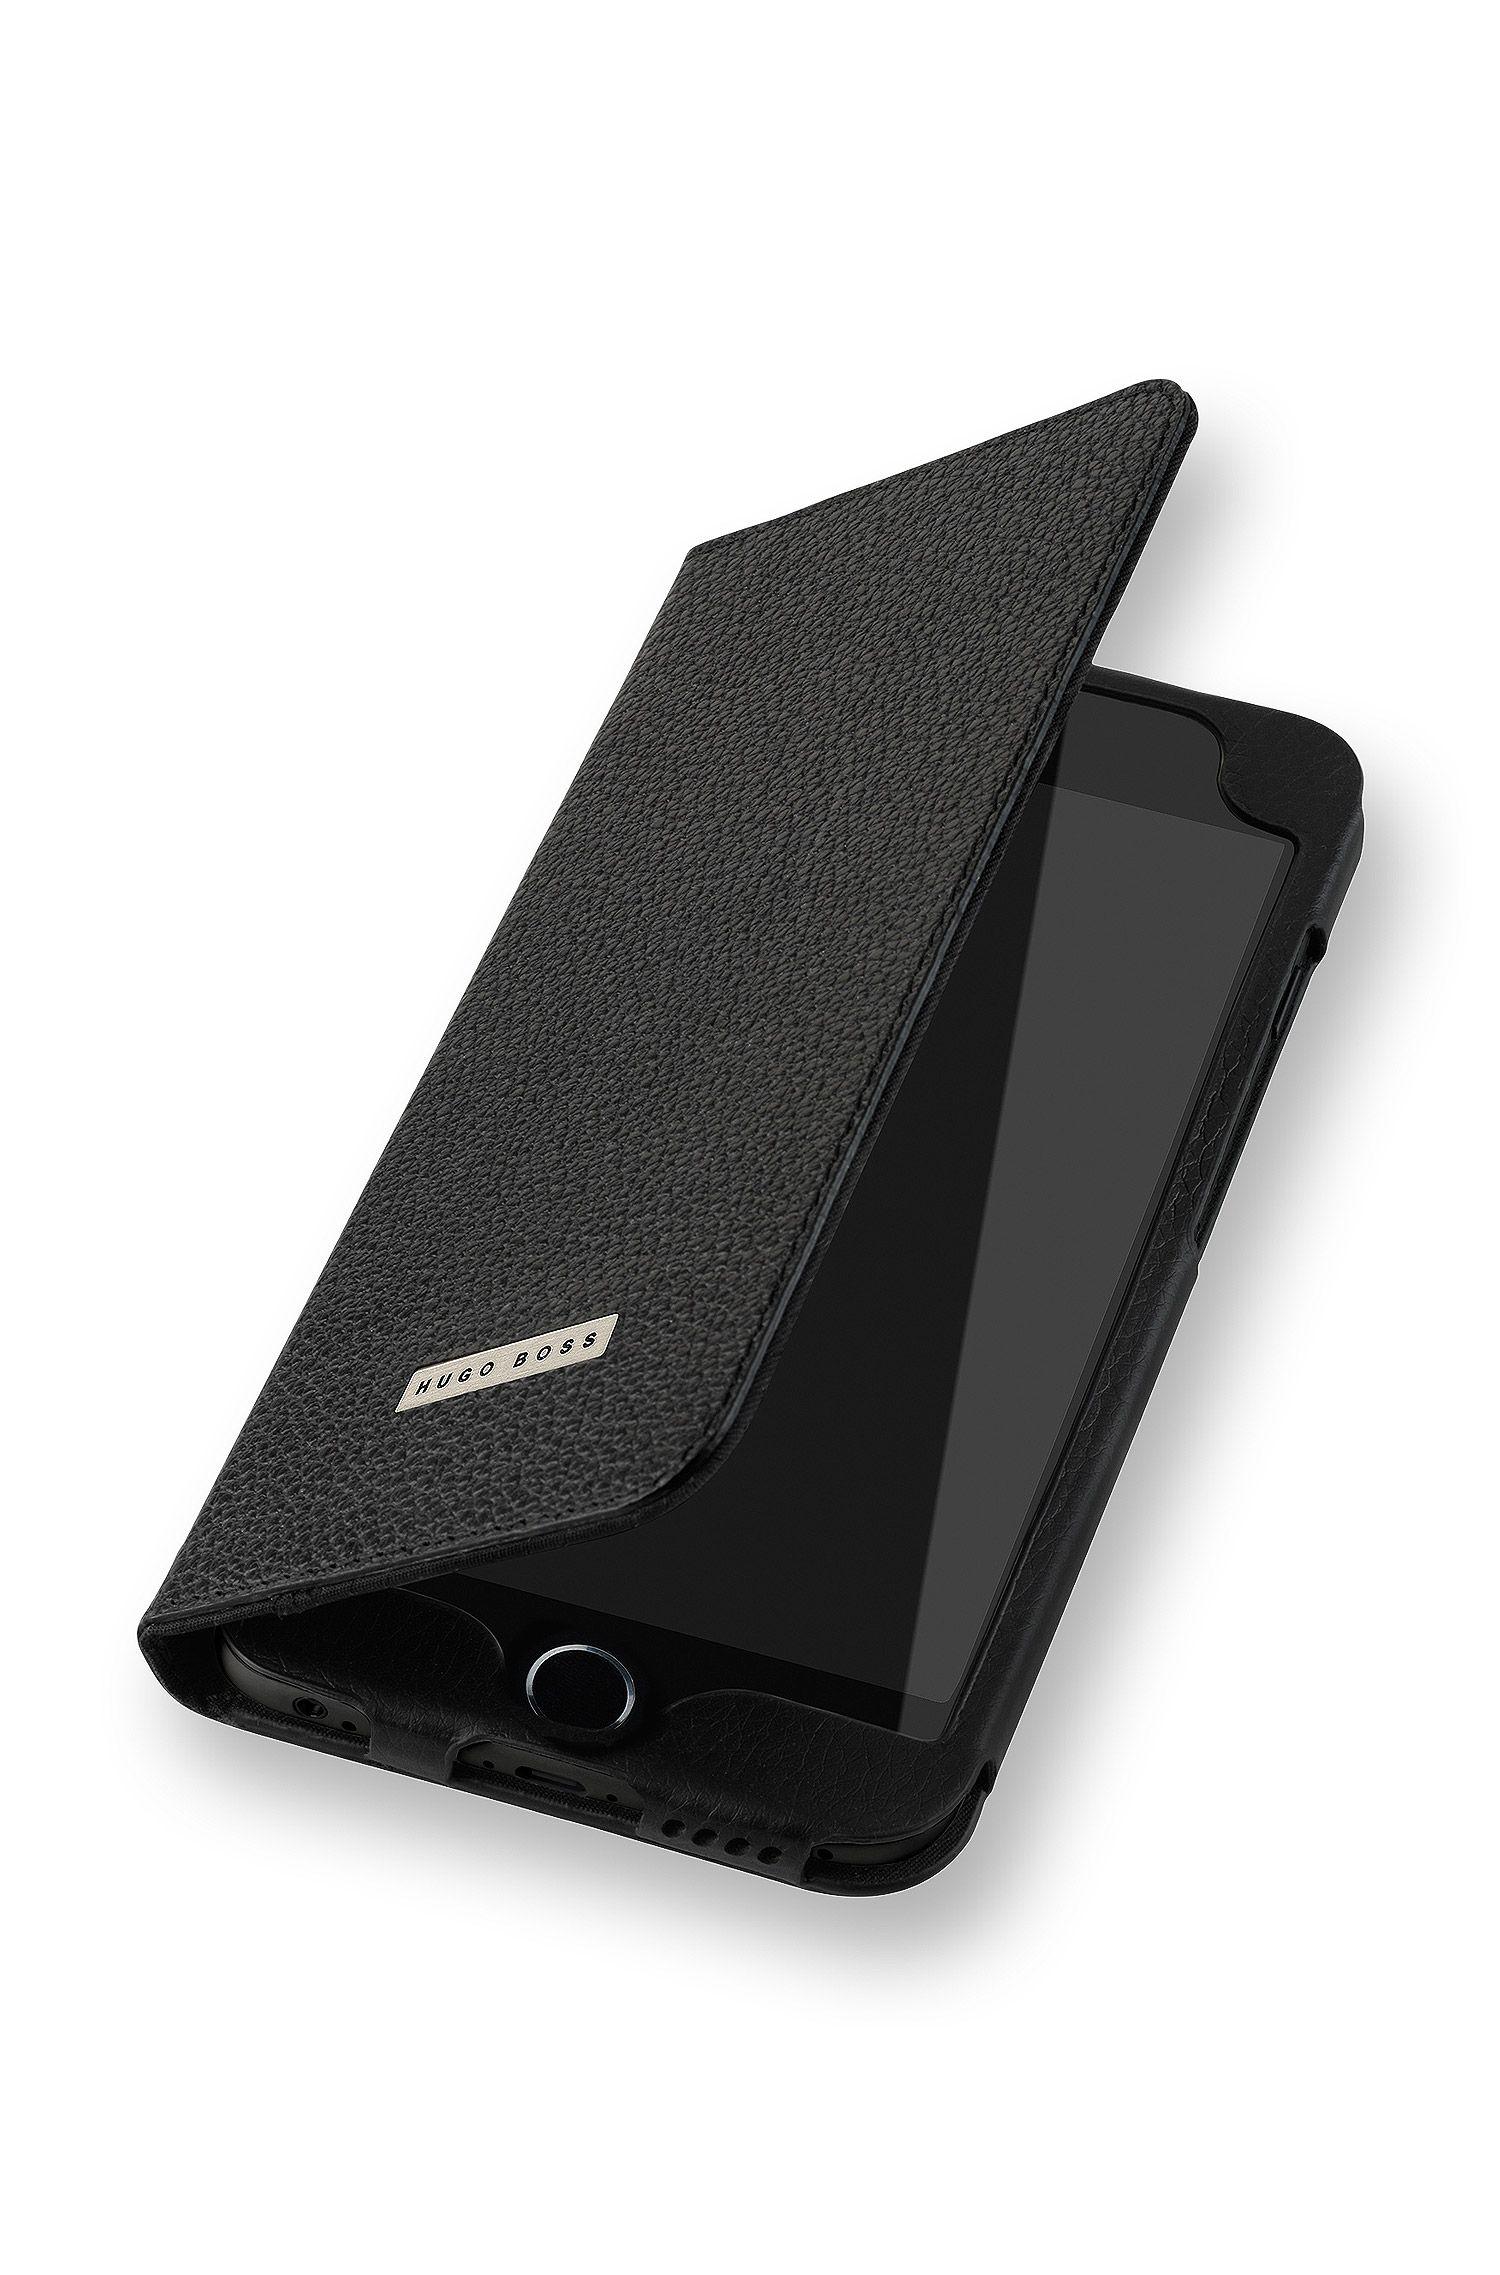 Booklet Case ´Folianti IP6 5.5` für iPhone 6